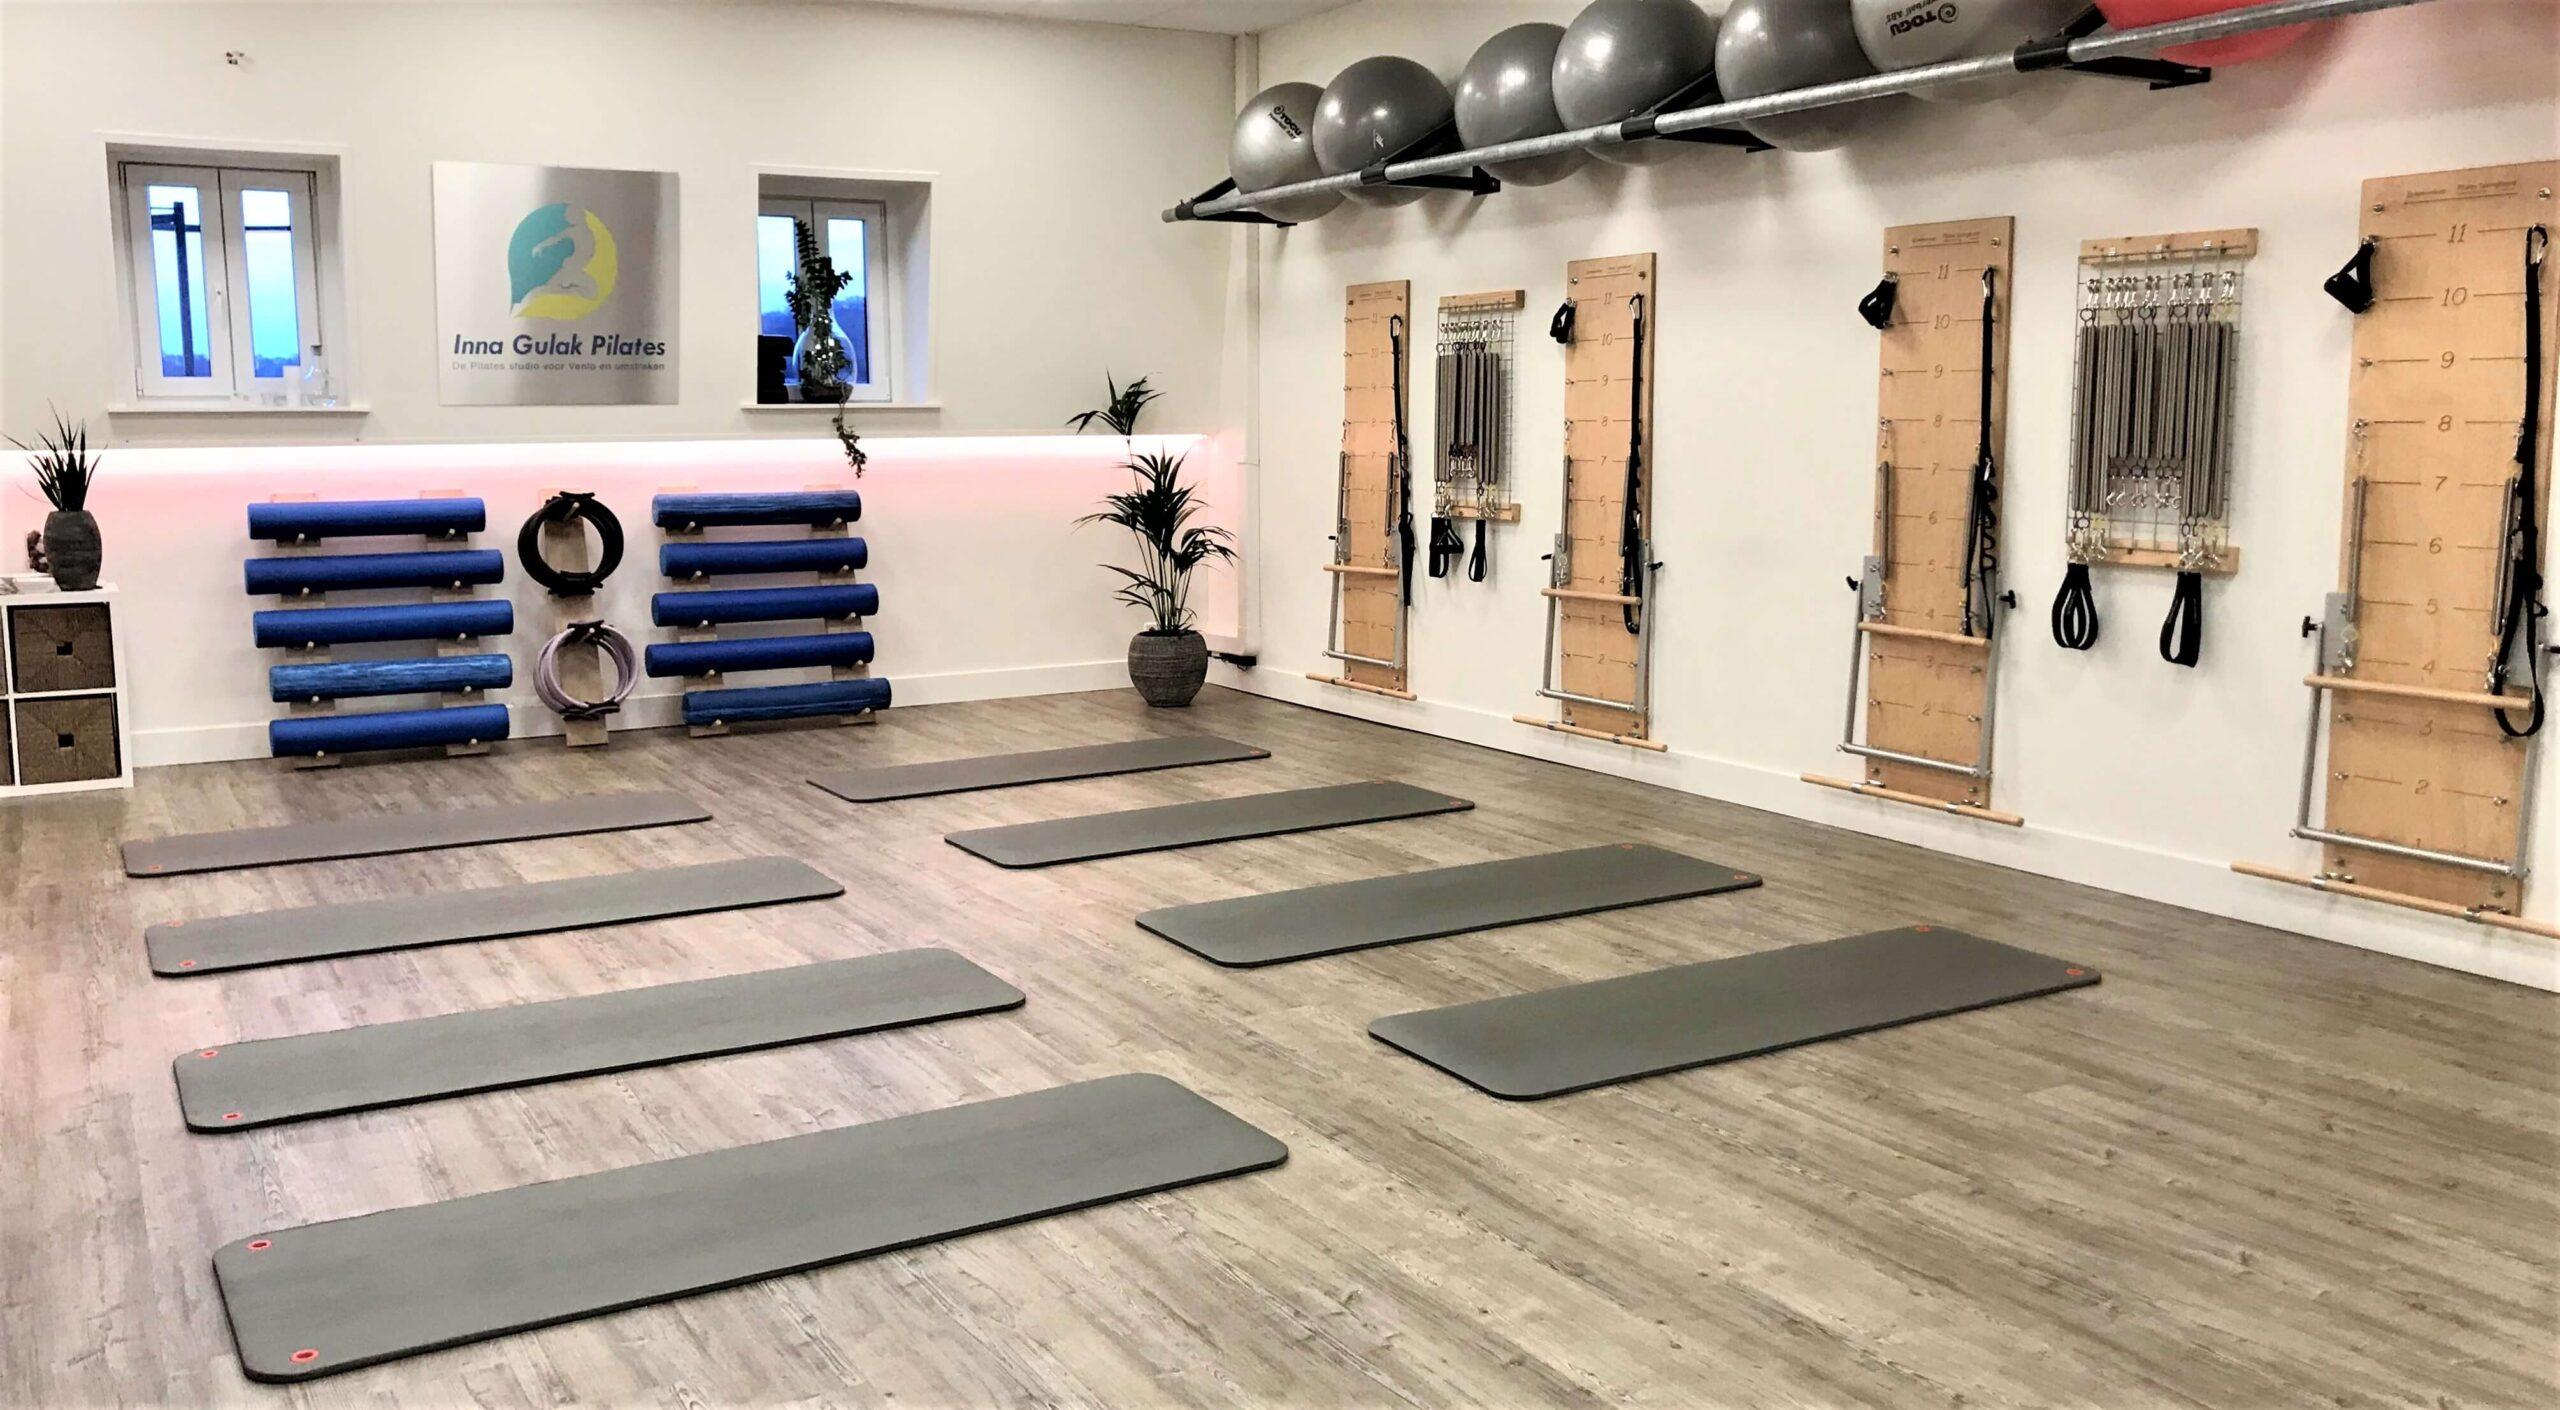 Pilates Venlo Inna Gulak Mat